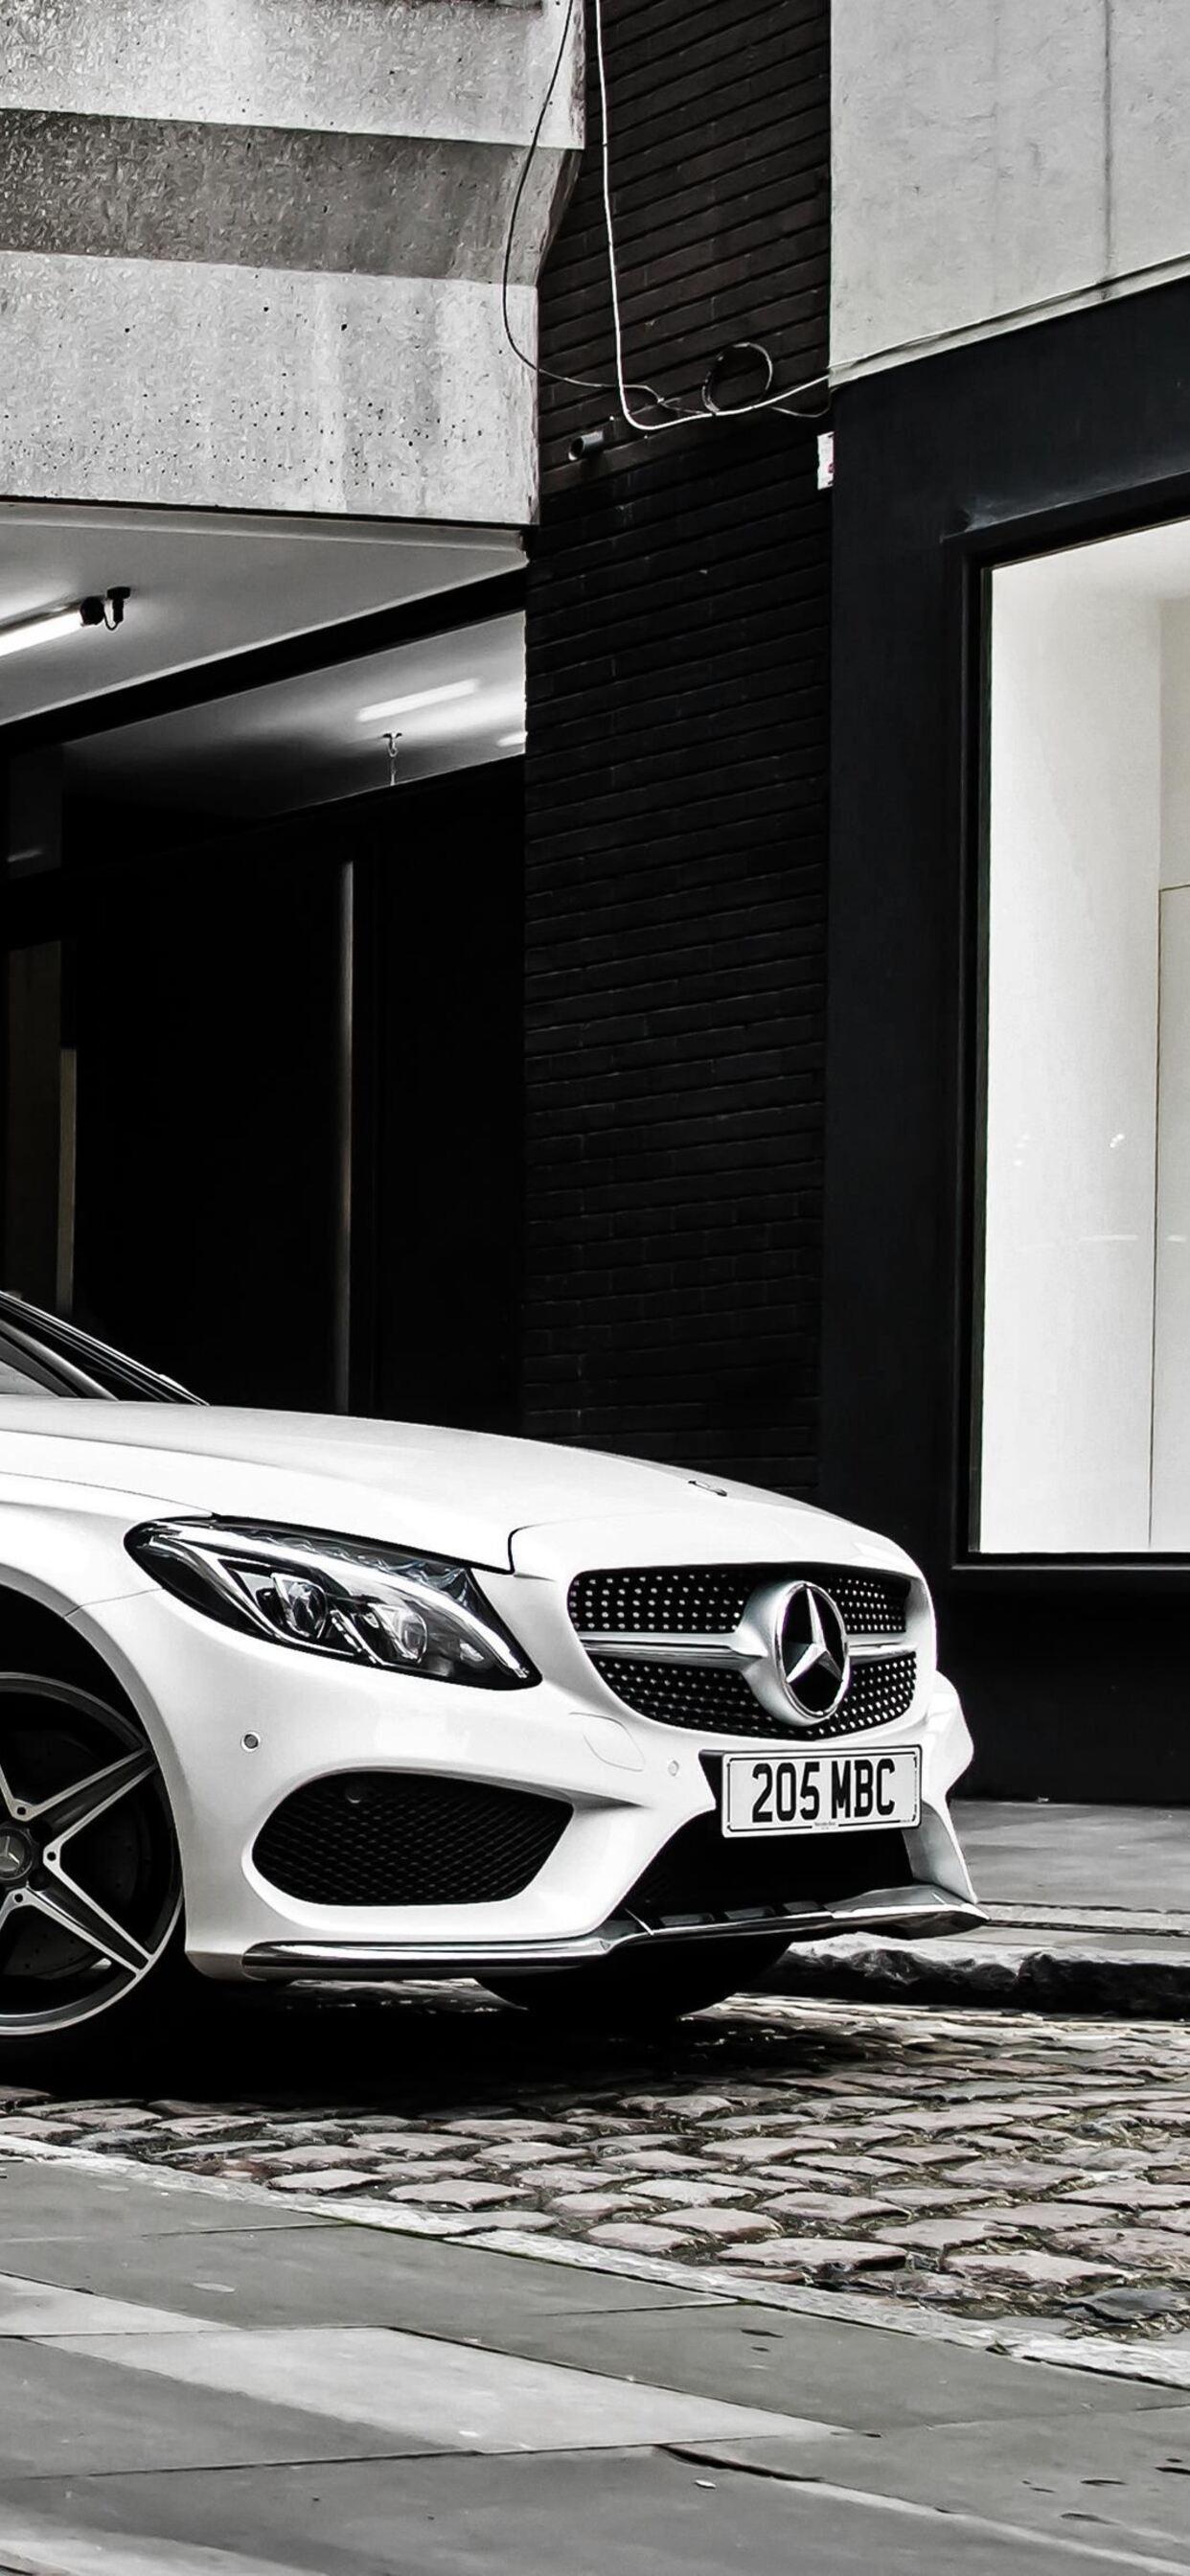 1242x2688 Mercedes Benz C Class Iphone Xs Max Hd 4k Wallpapers